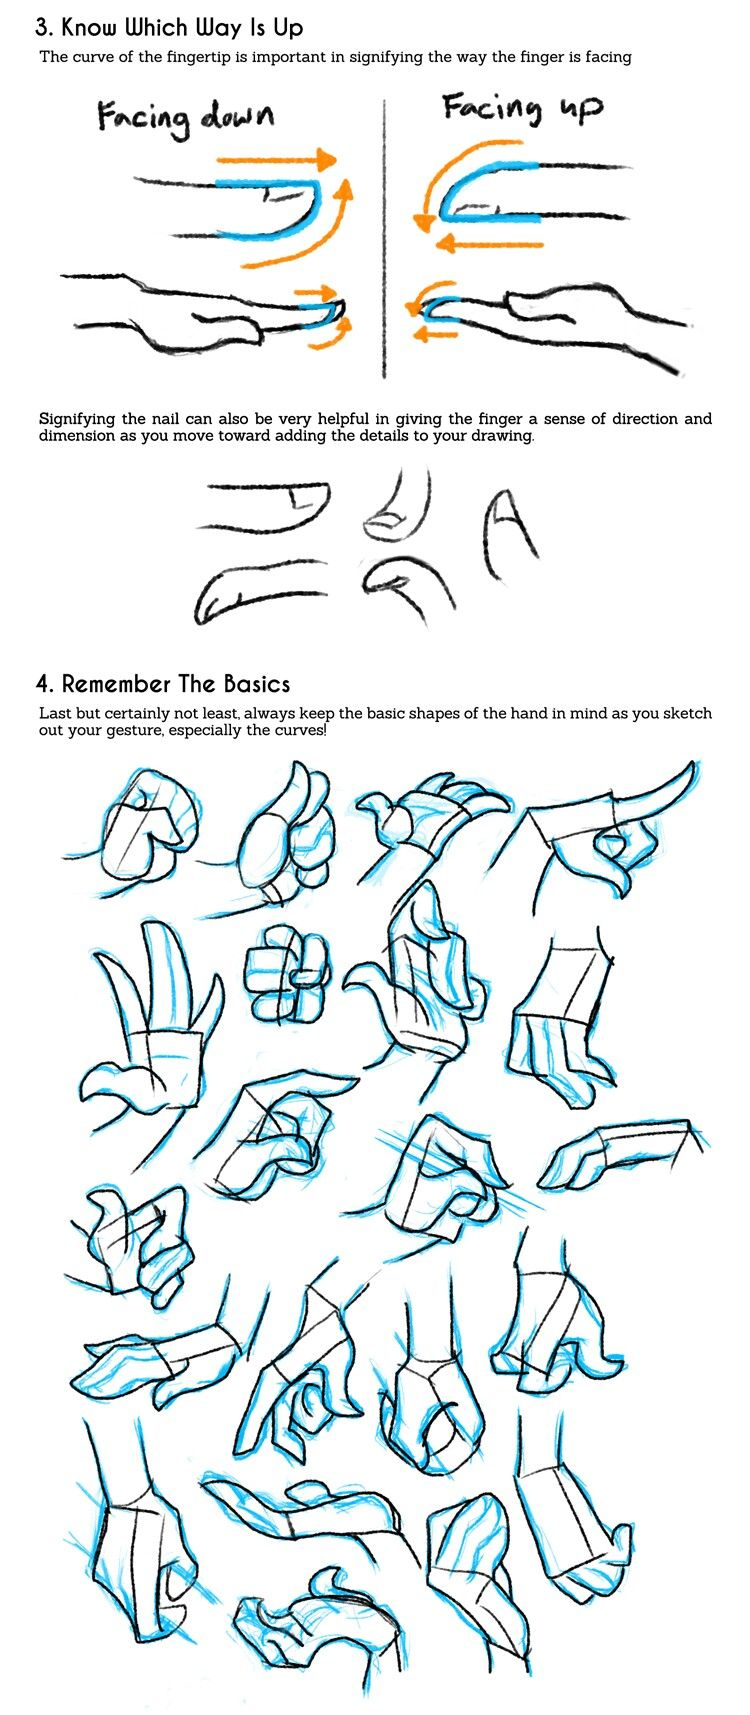 Dedos manos | Dibujos | Pinterest | Anatomía, Dibujo y Dibujar